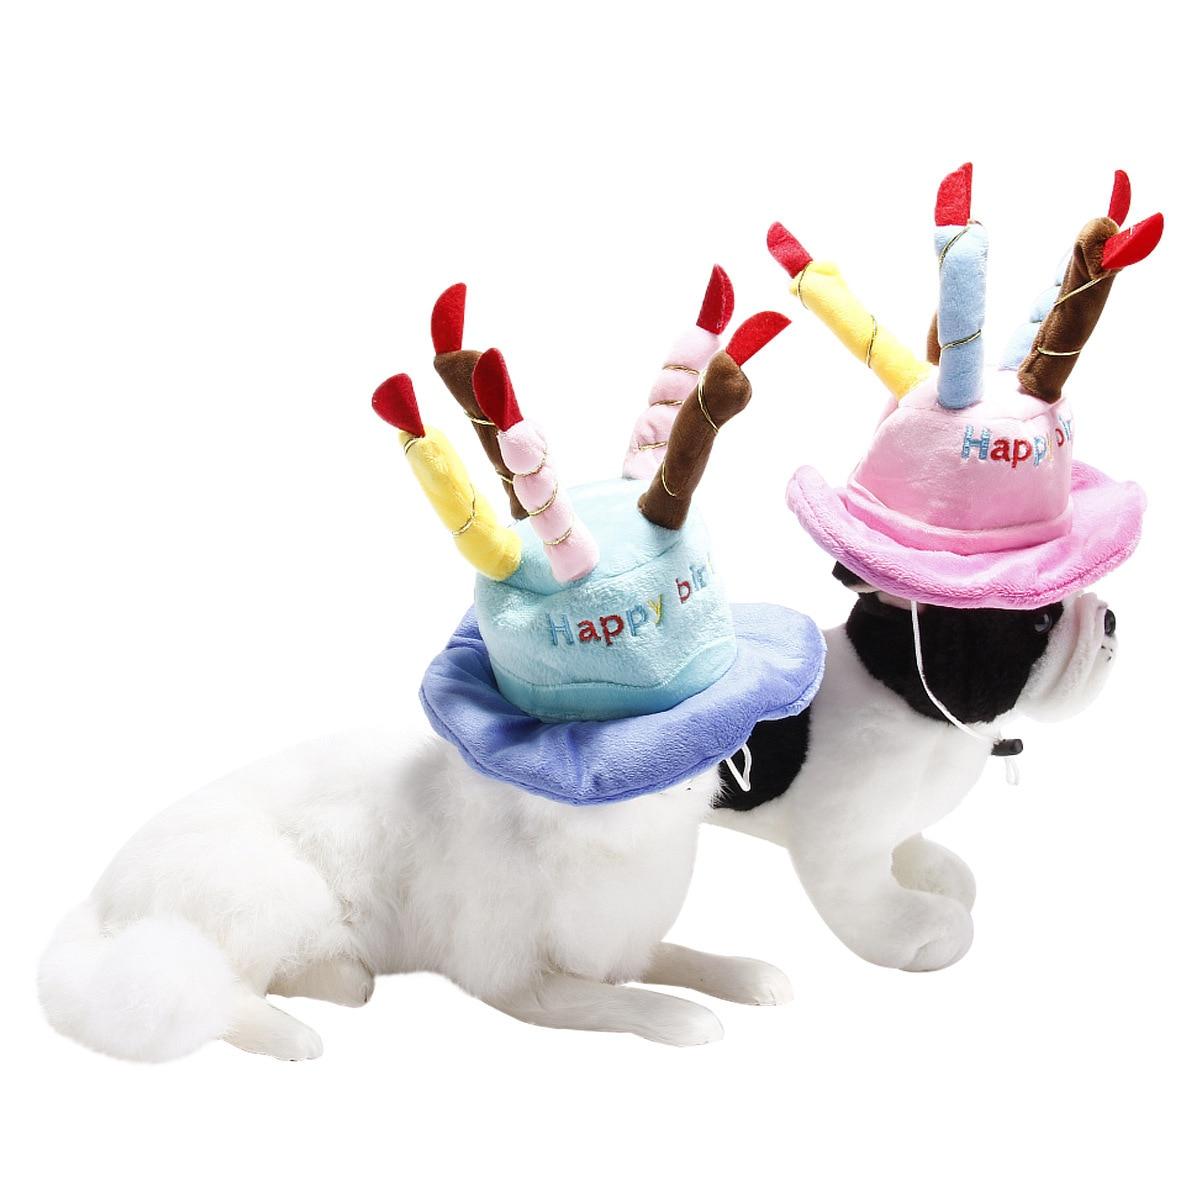 Pet Dog Cat Birthday Cake Hat Adjustable Corduroy Colorful Candles Dog Birthday Party Costume Headdress Pet Supplies